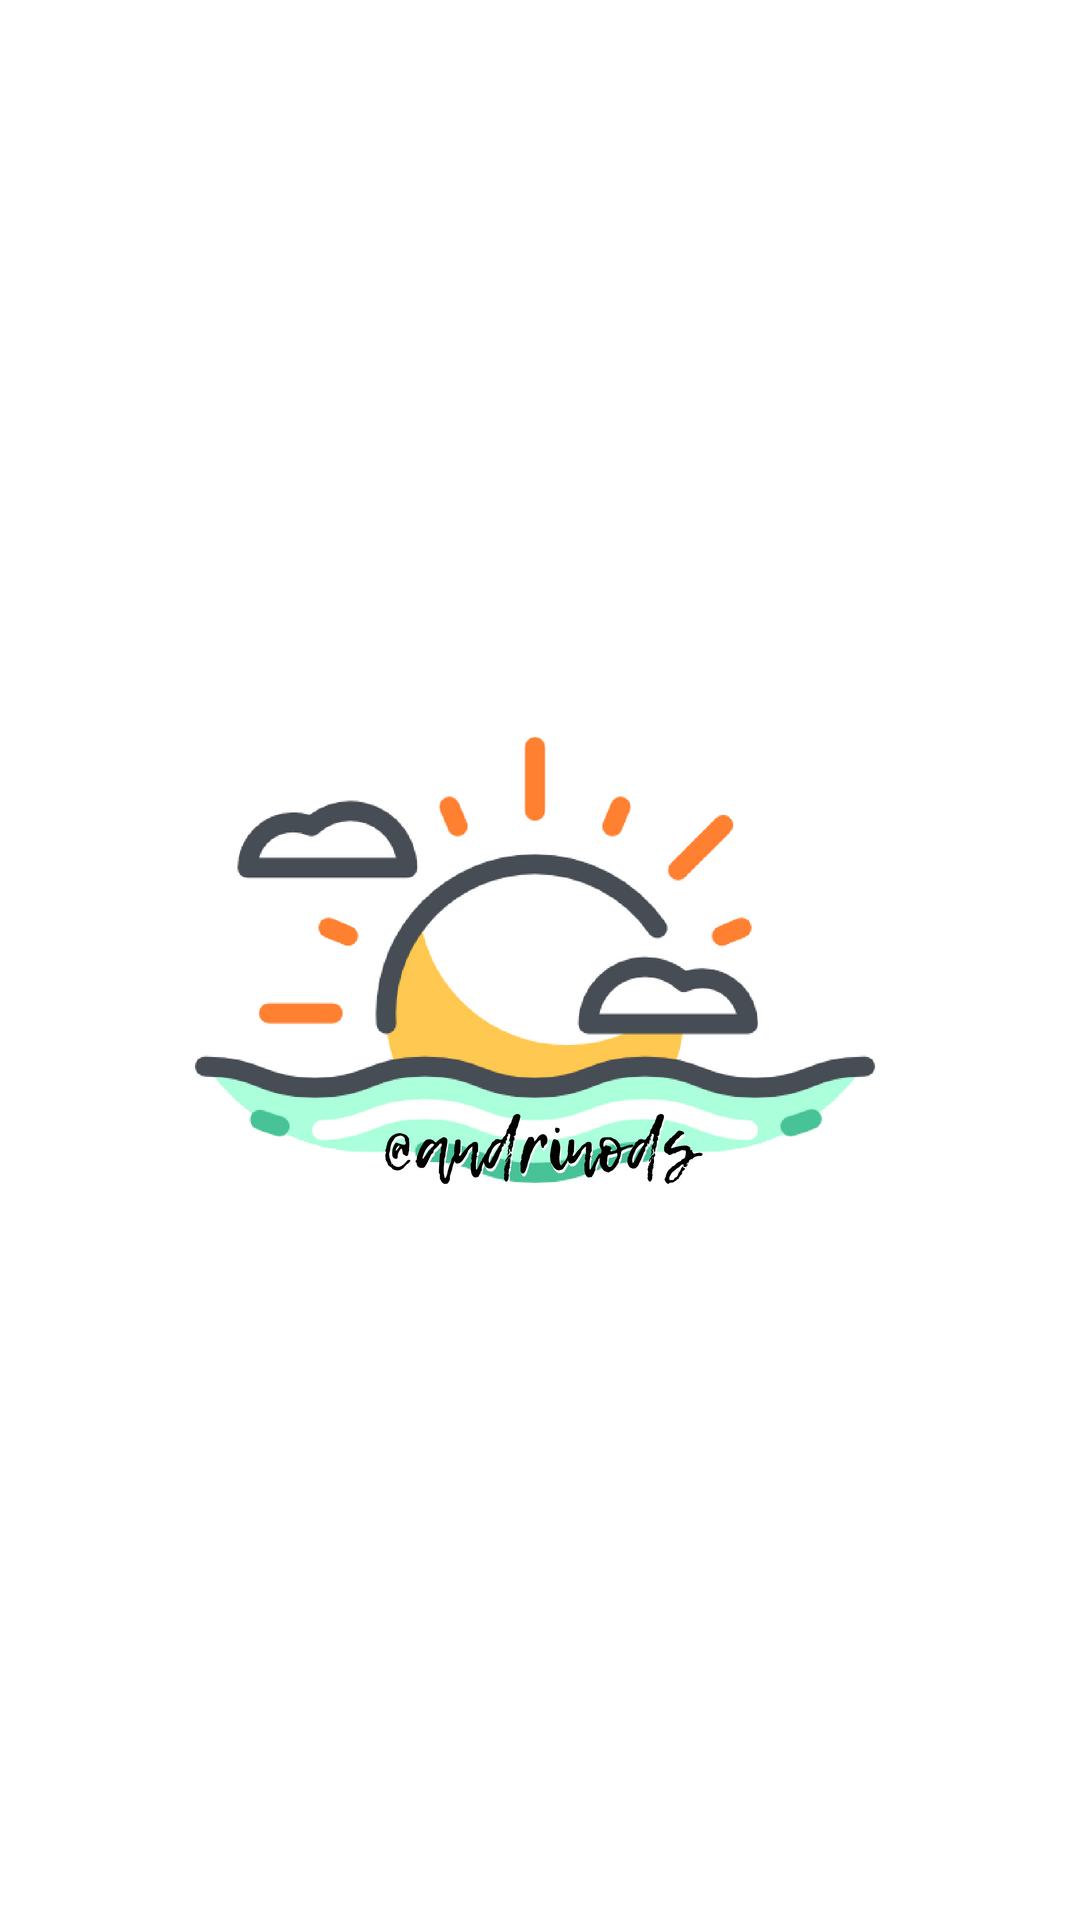 stephanie andrino andrinods fotos y videos de instagram beach icon sunset logo instagram highlight icons instagram highlight icons